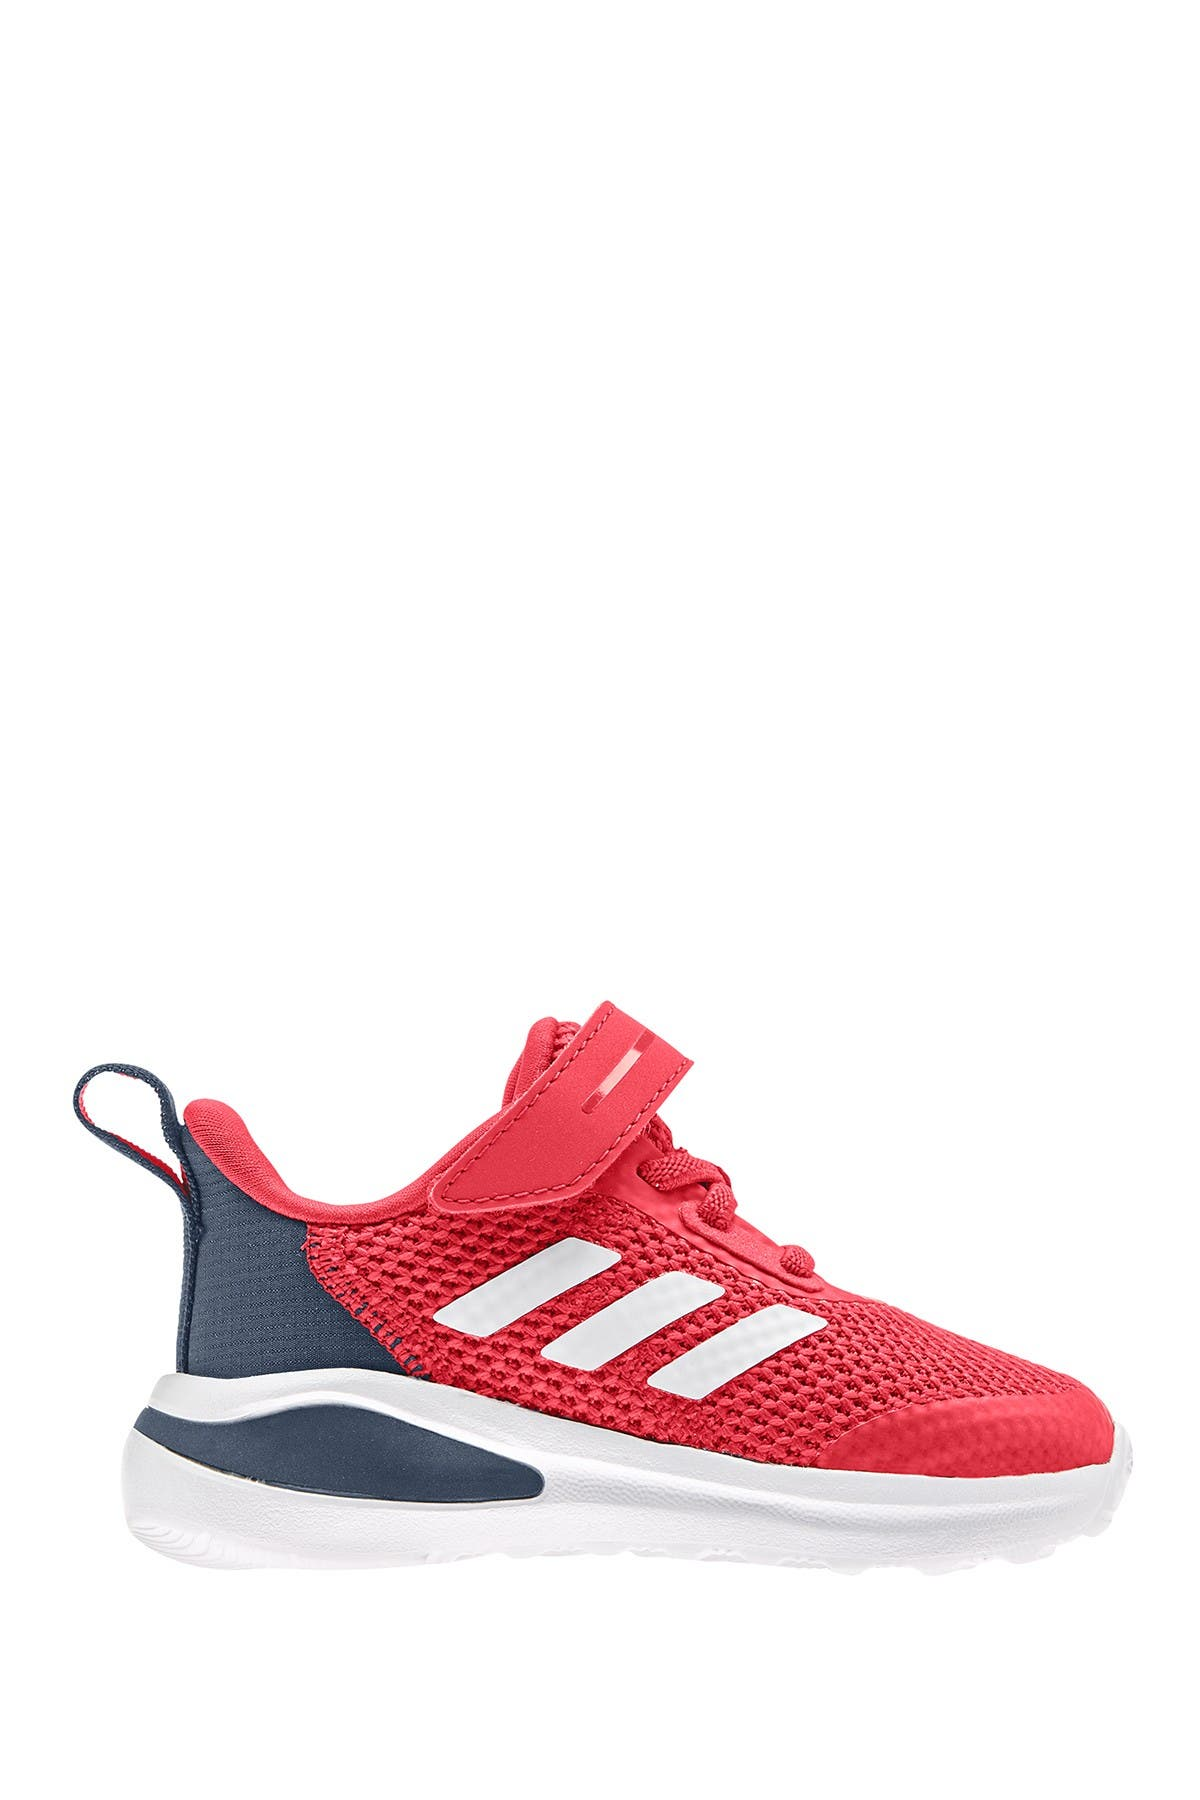 Image of adidas Fortarun EL Athletic Sneaker